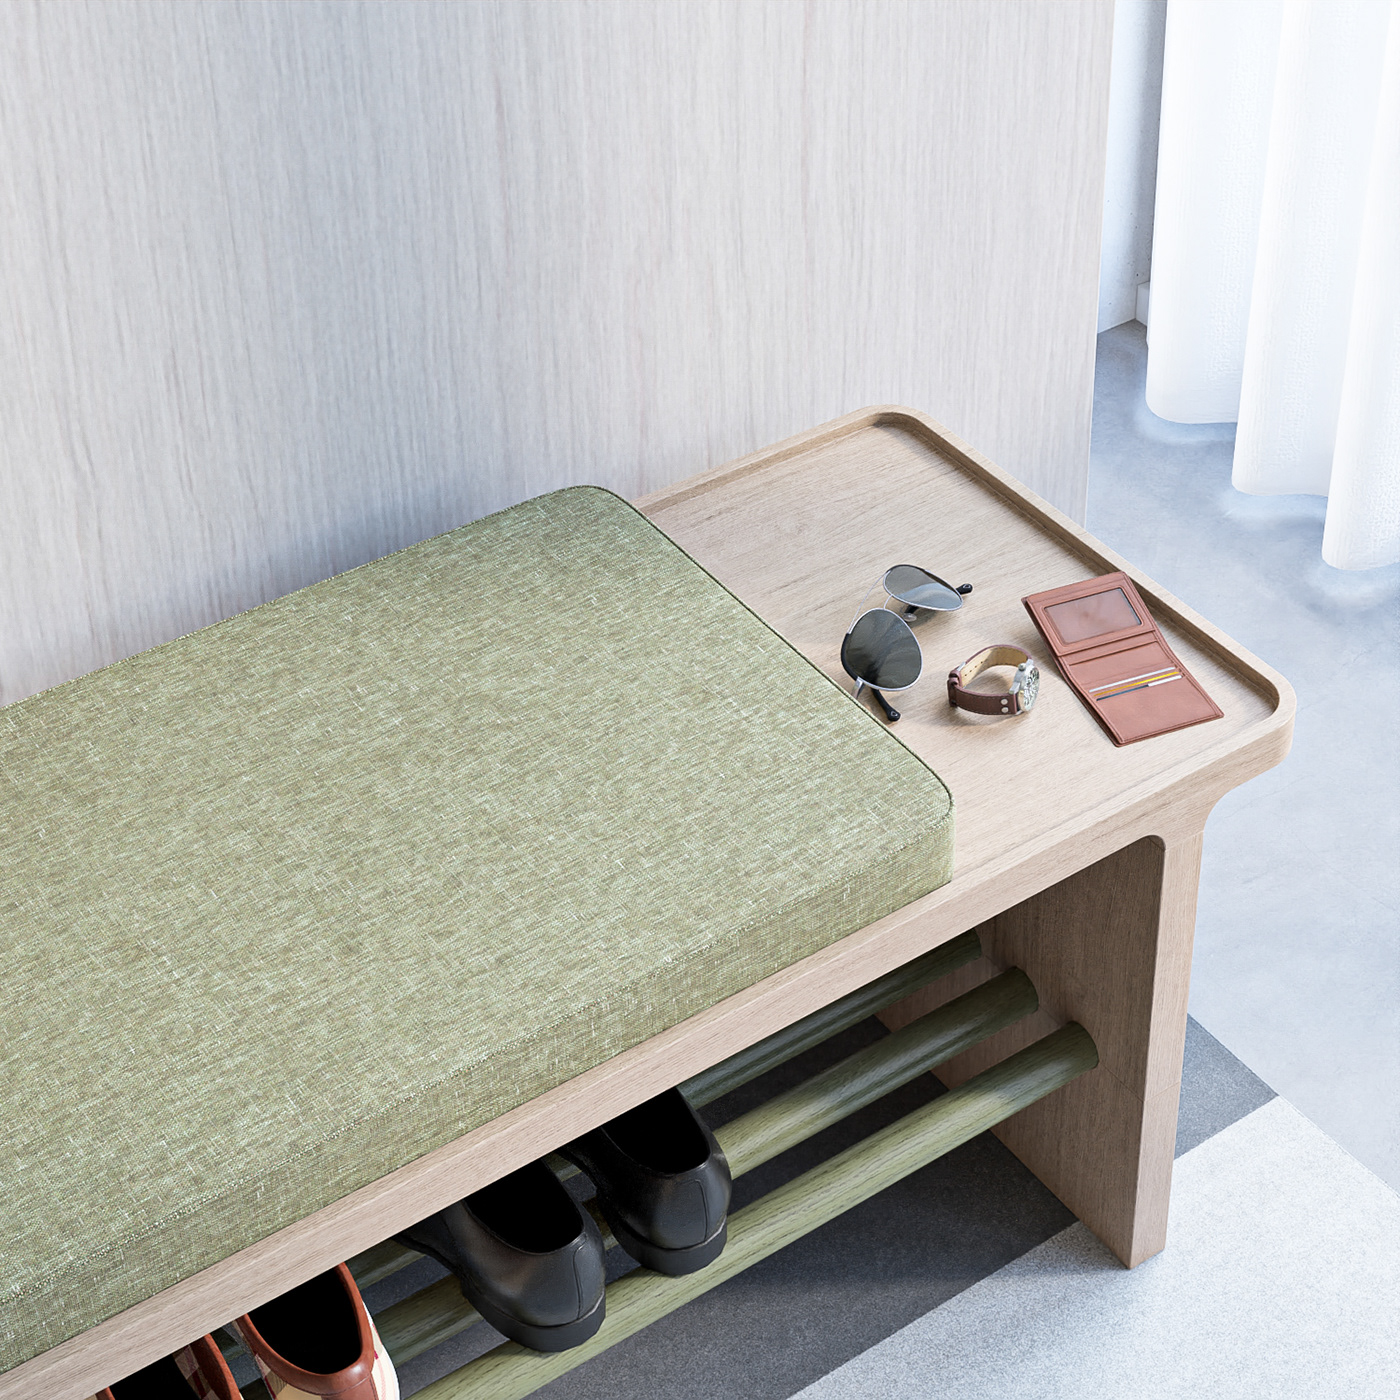 bench design furniture minimal product design  seat Shoe rack wood